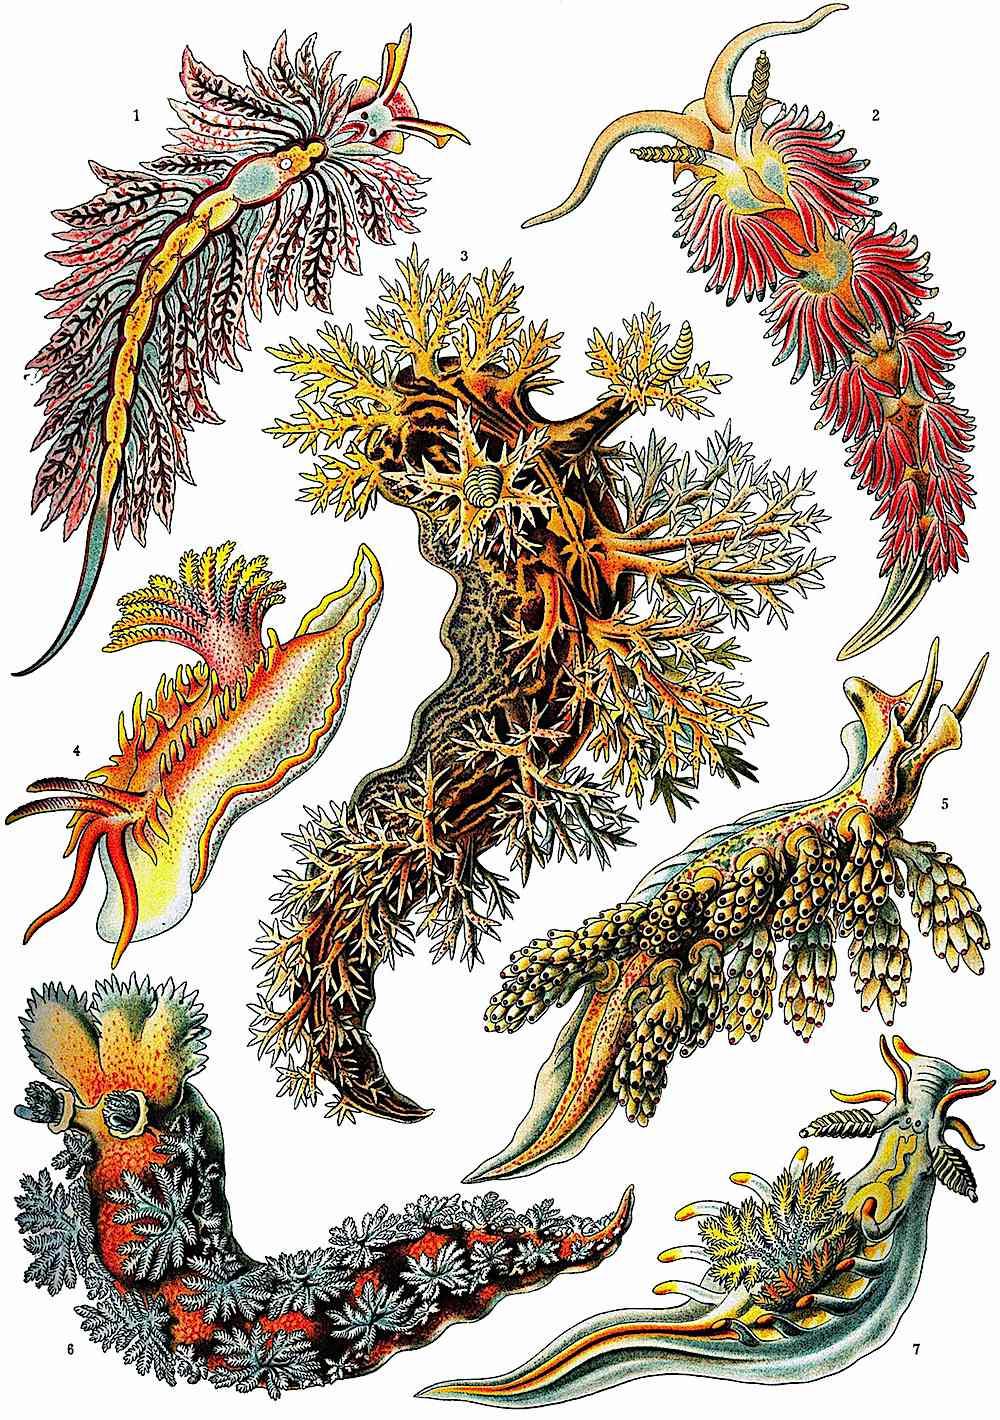 Ernst Haeckel odd sea creatures, a color illustration